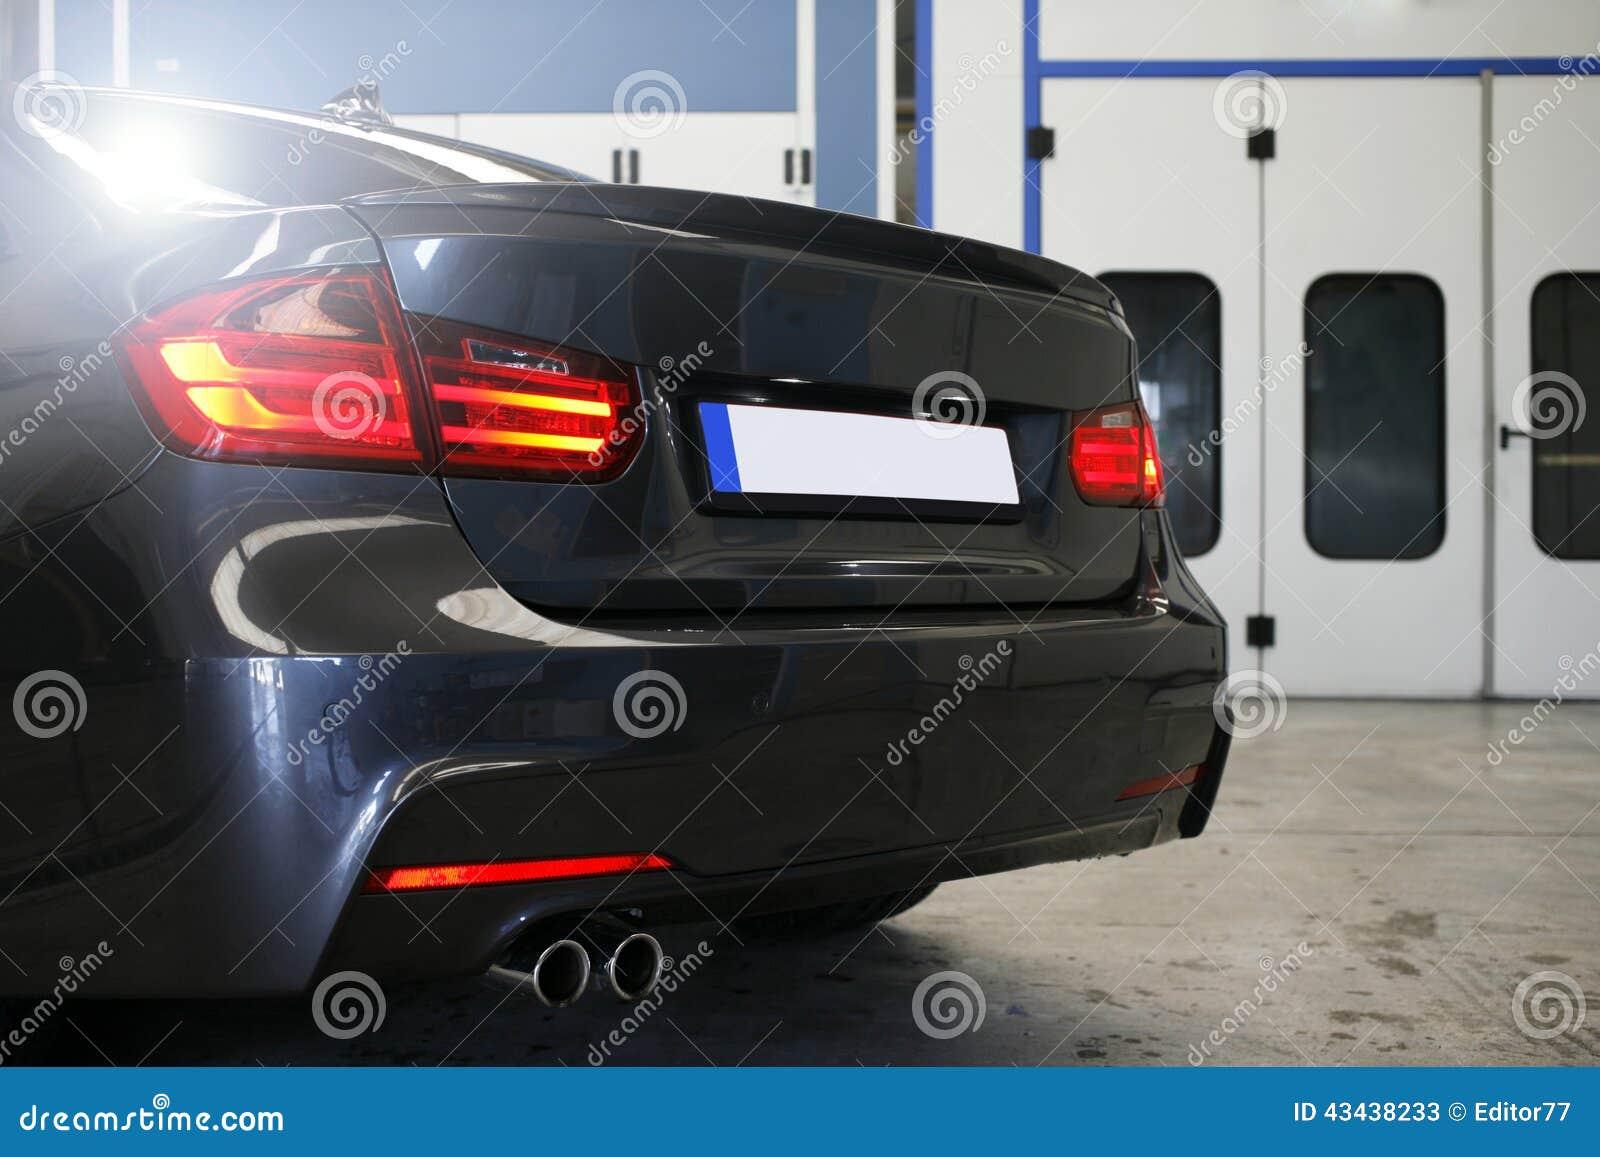 Luxury limousine inside car service stock photo image 43438233